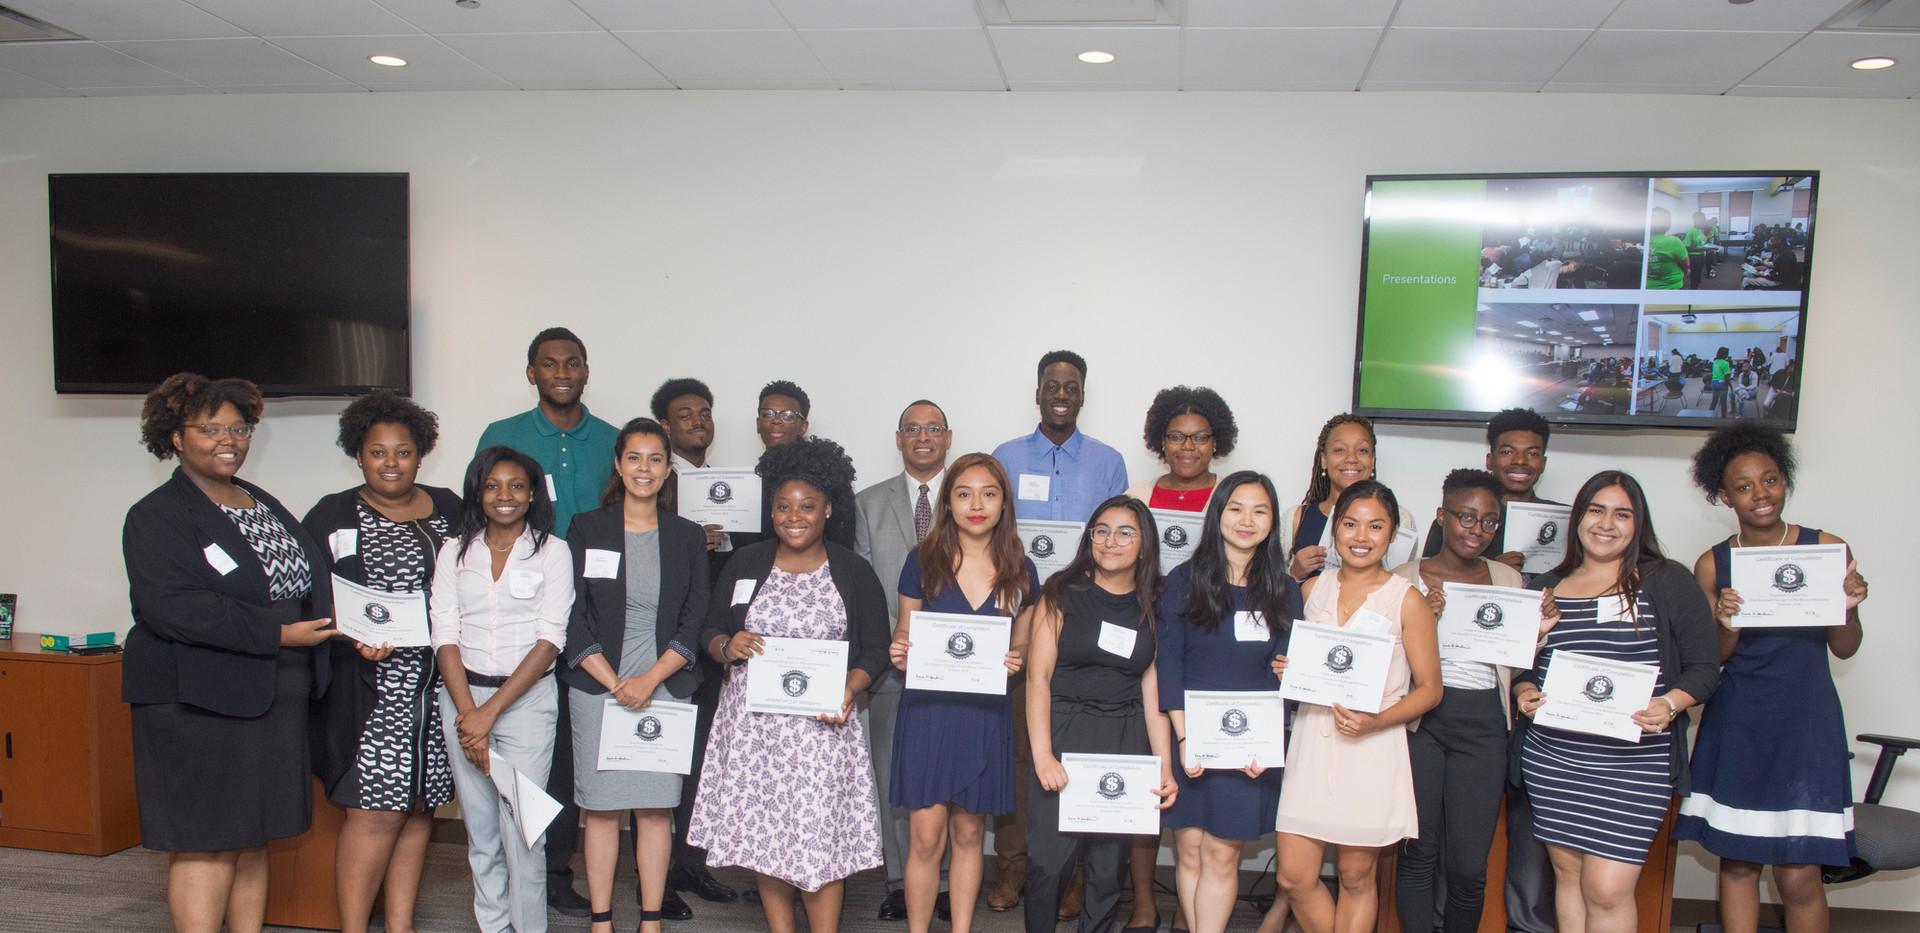 Interns graduation group pic.jpg